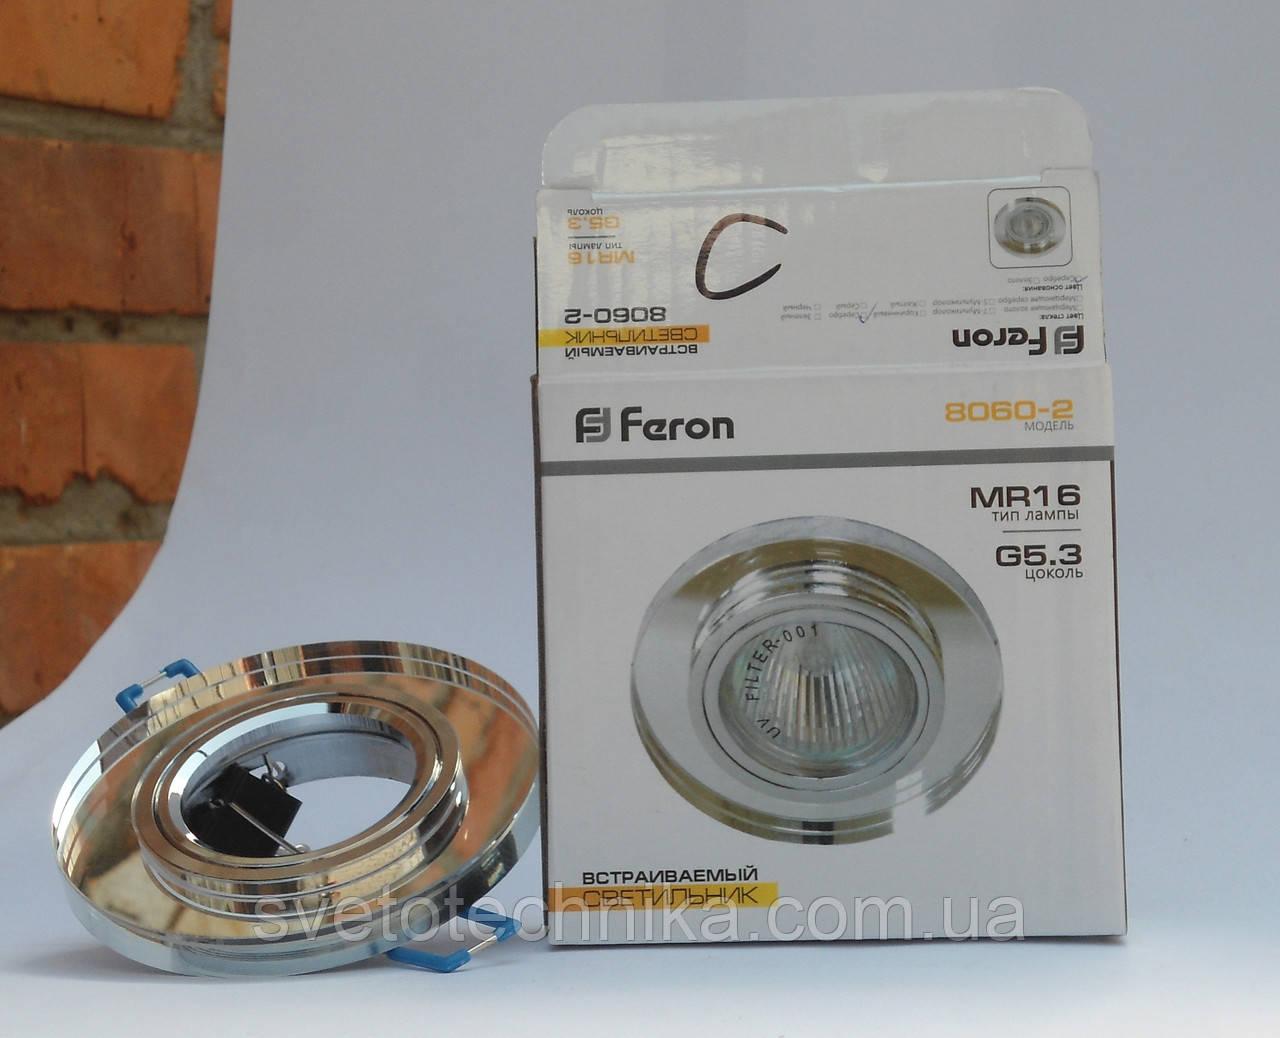 Светильник Feron 8060 MR16 прозрачный (цвет корпуса серебро-серебро)